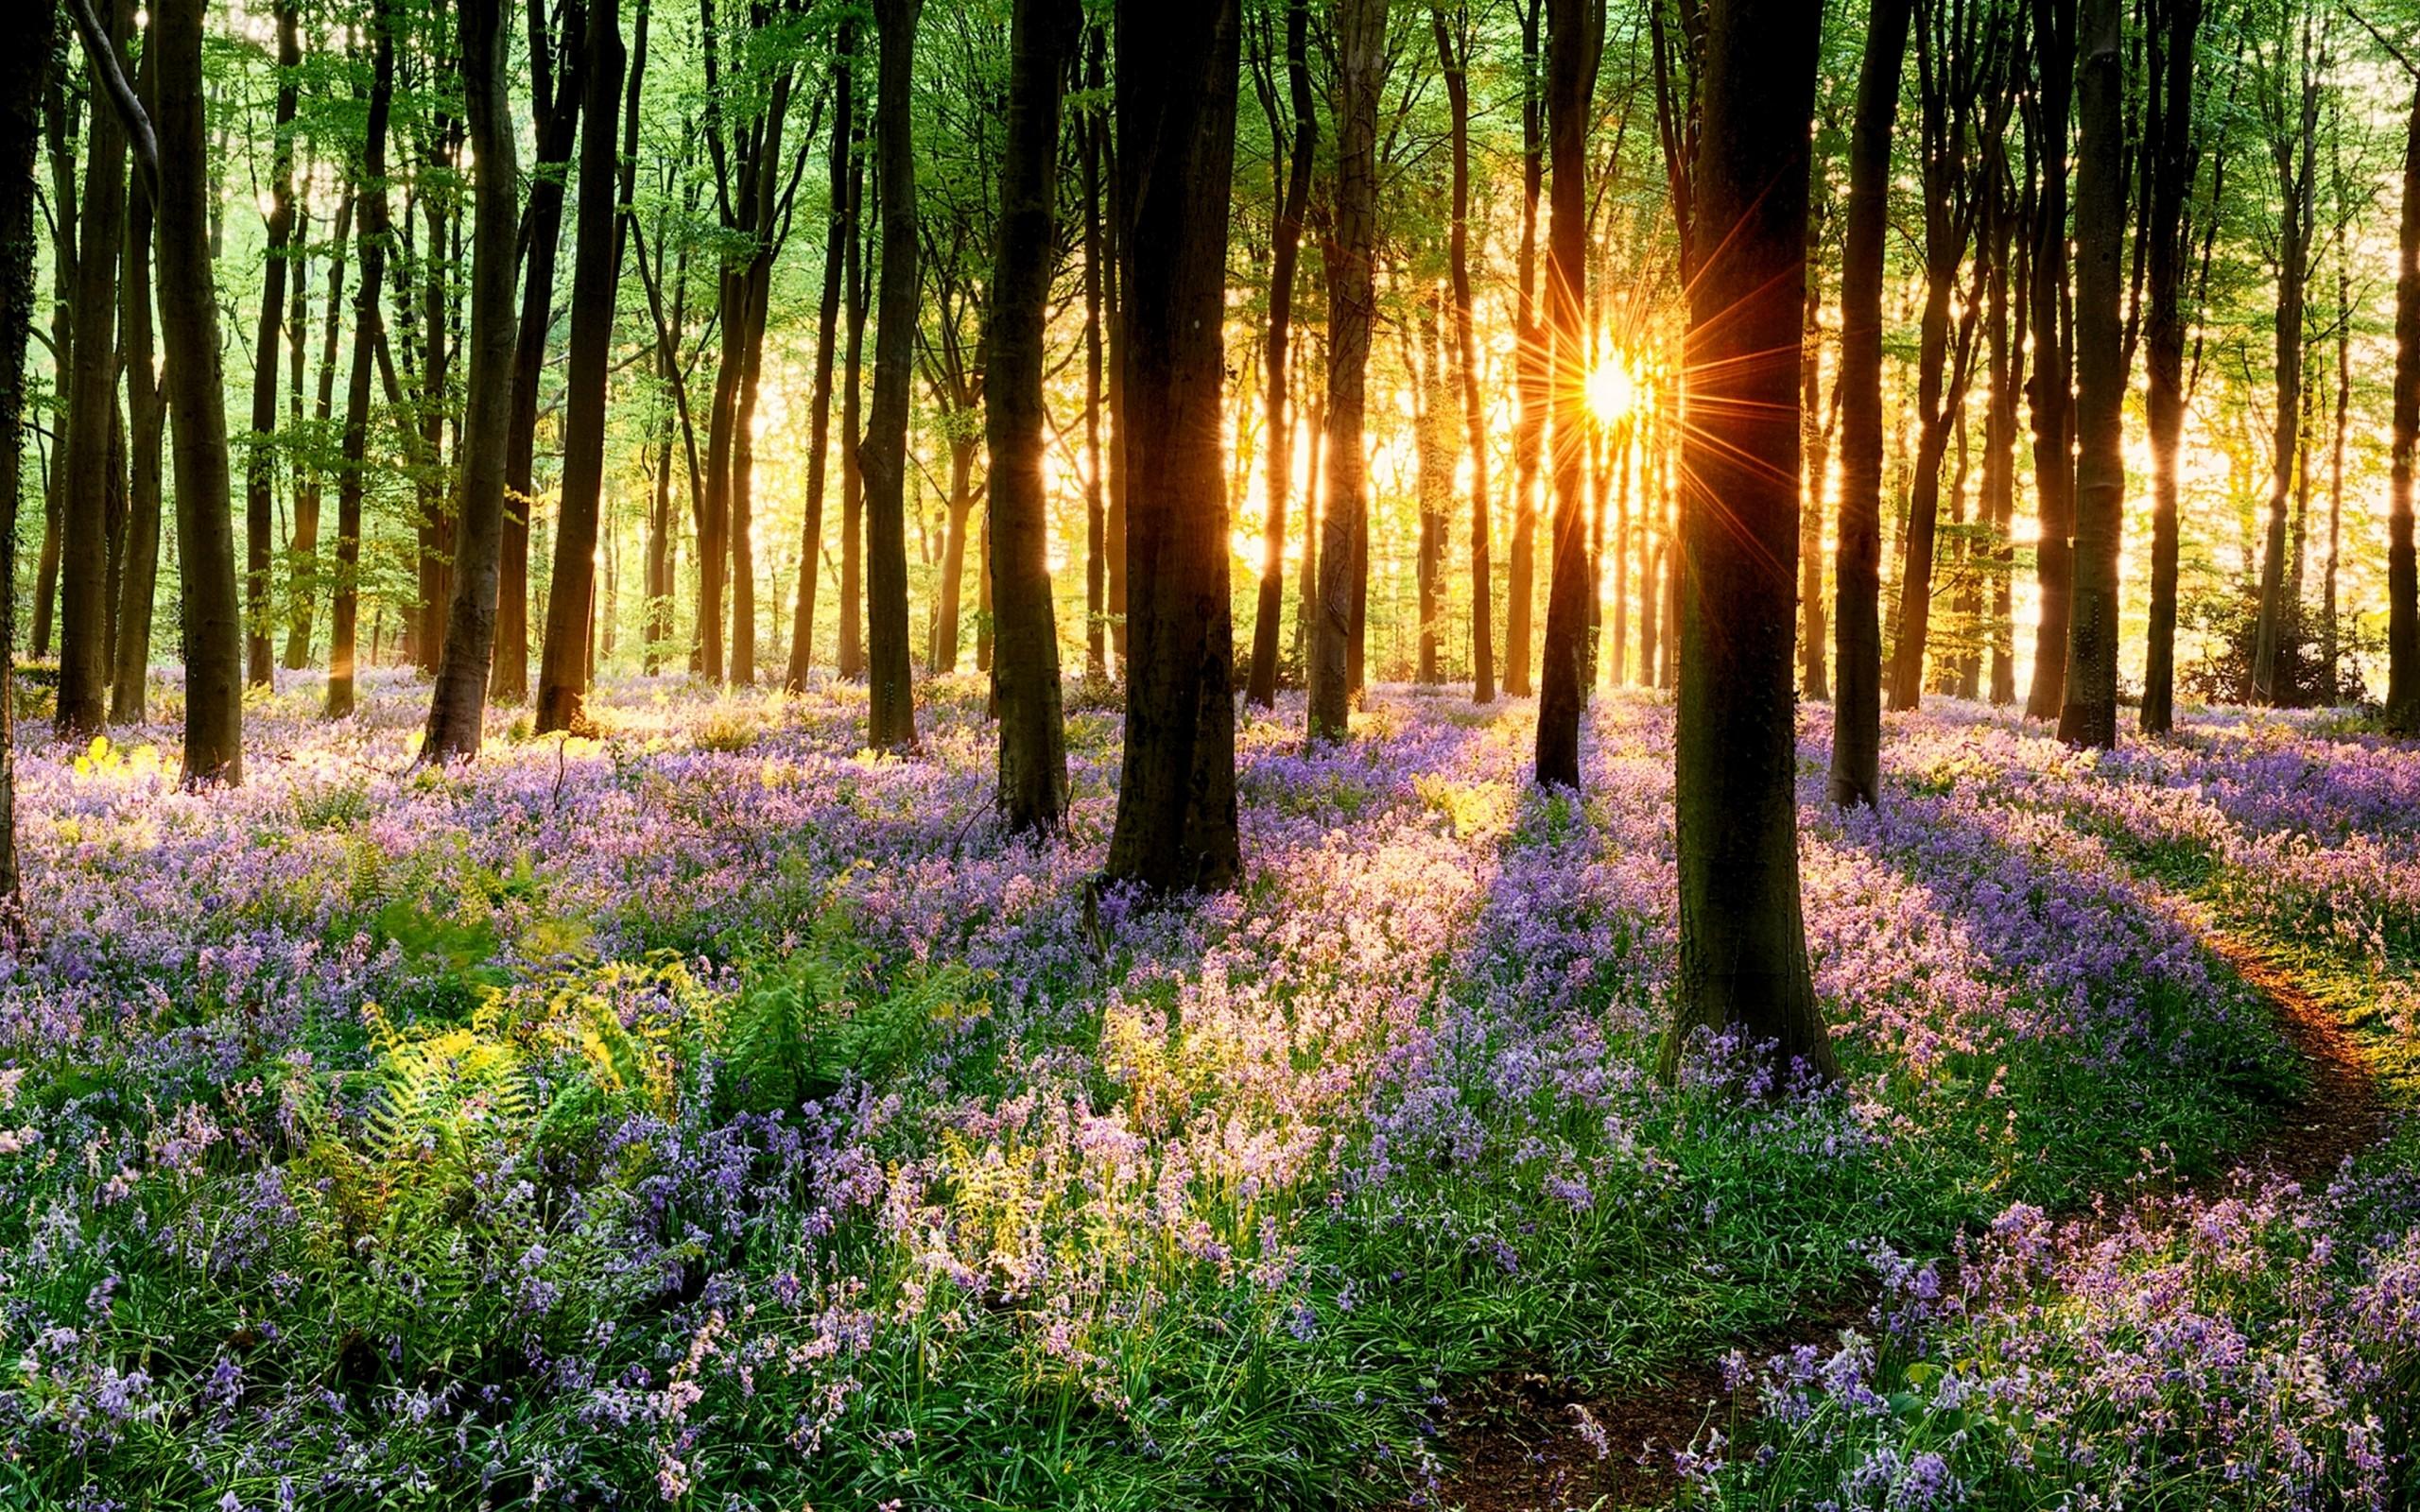 Spring grass on sunset 4K Ultra HD wallpaper 4k WallpaperNet 2560x1600